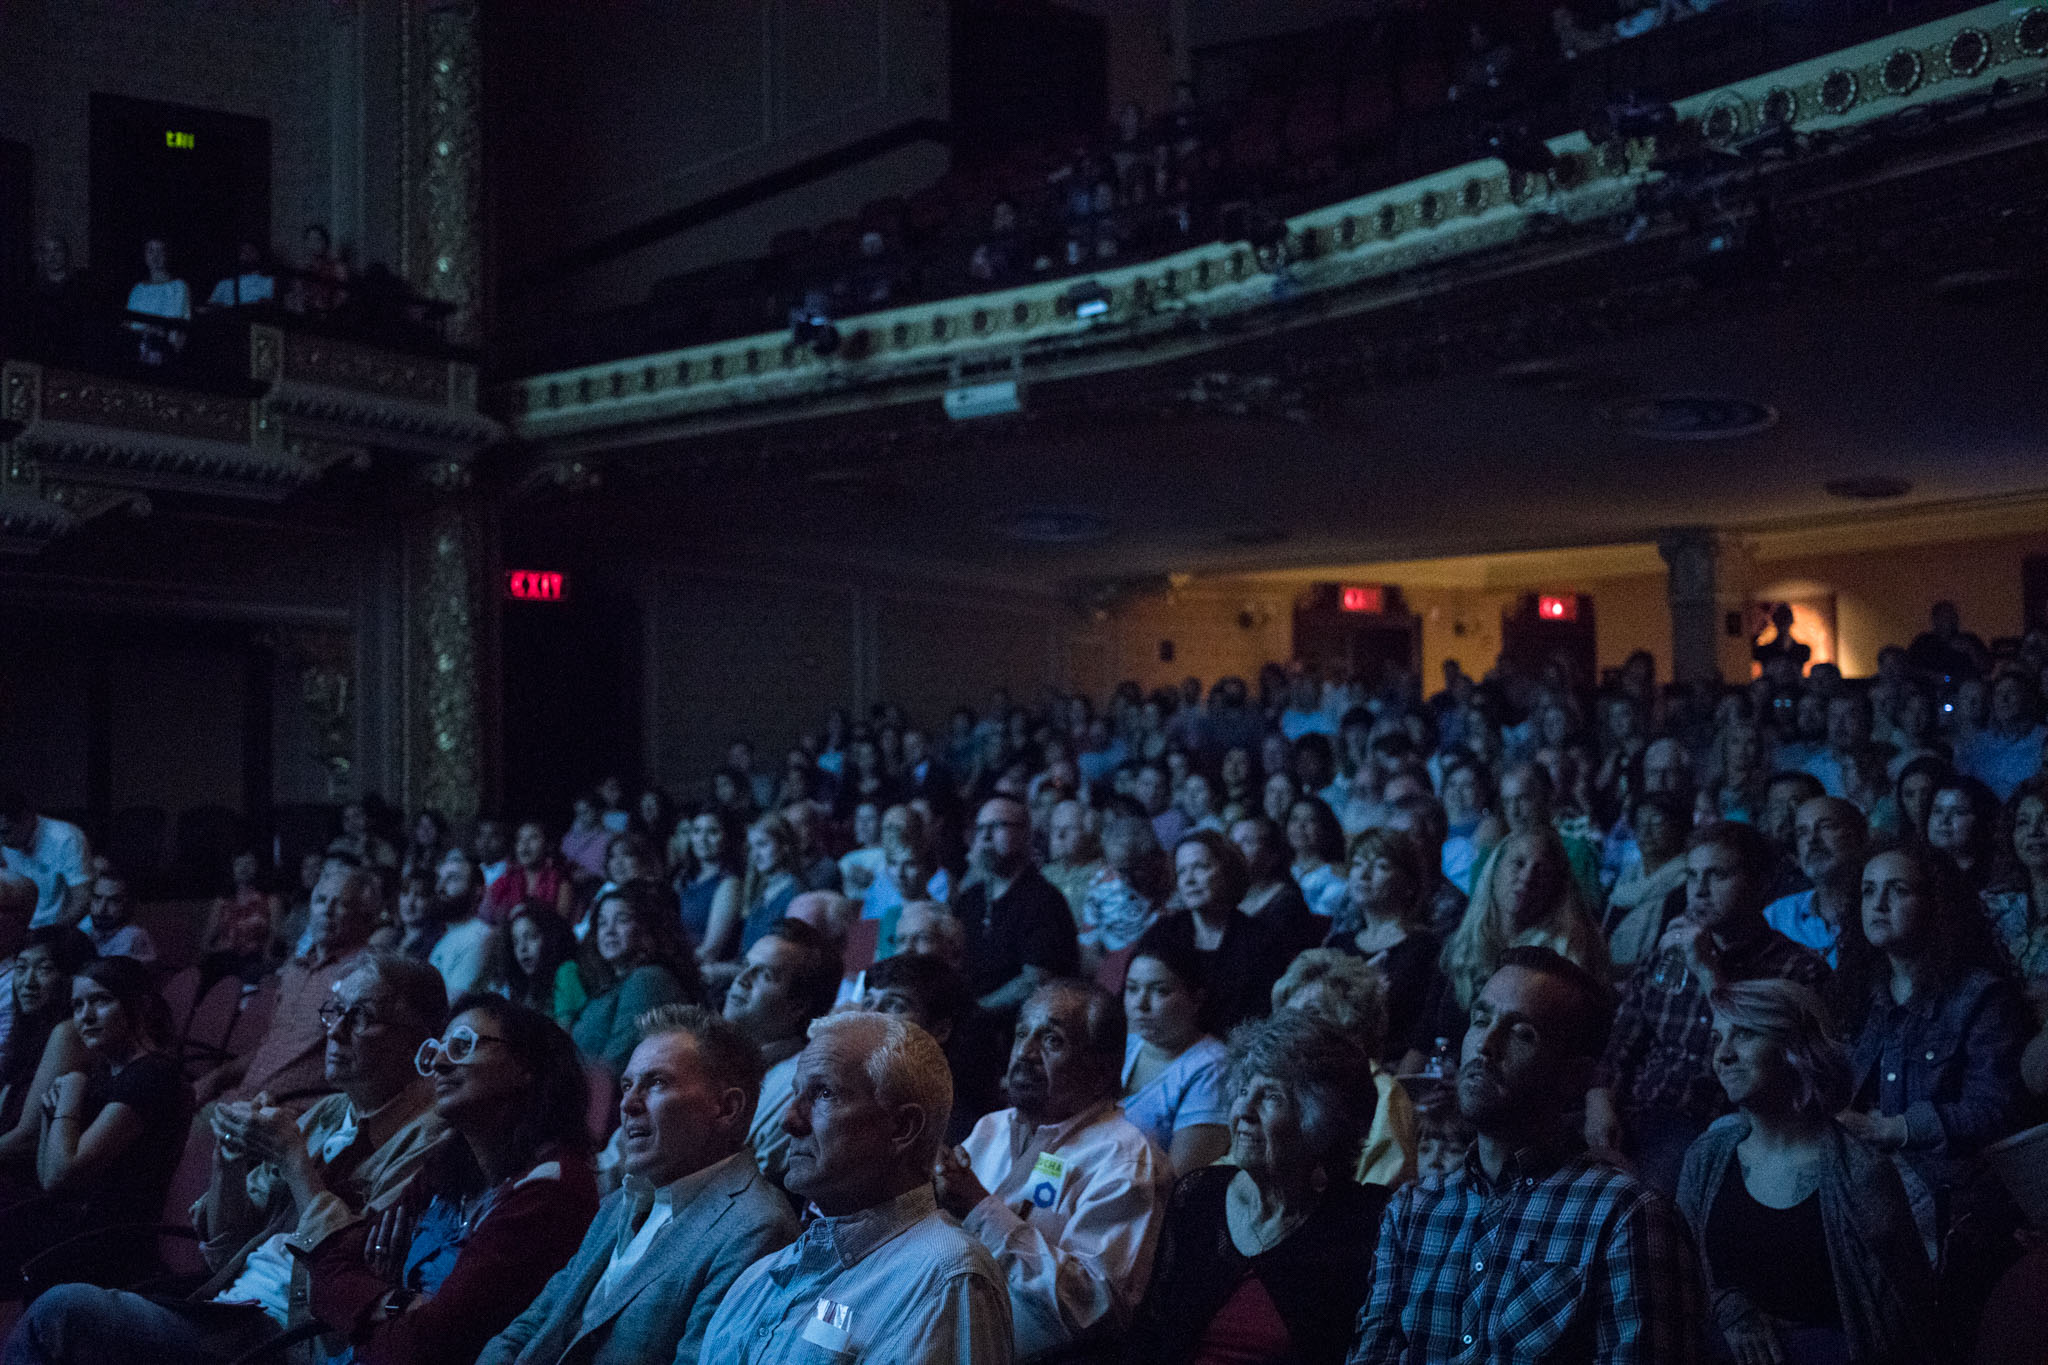 A large crowd fills Charline McCombs Empire Theatre to watch PechaKucha Vol. 27.